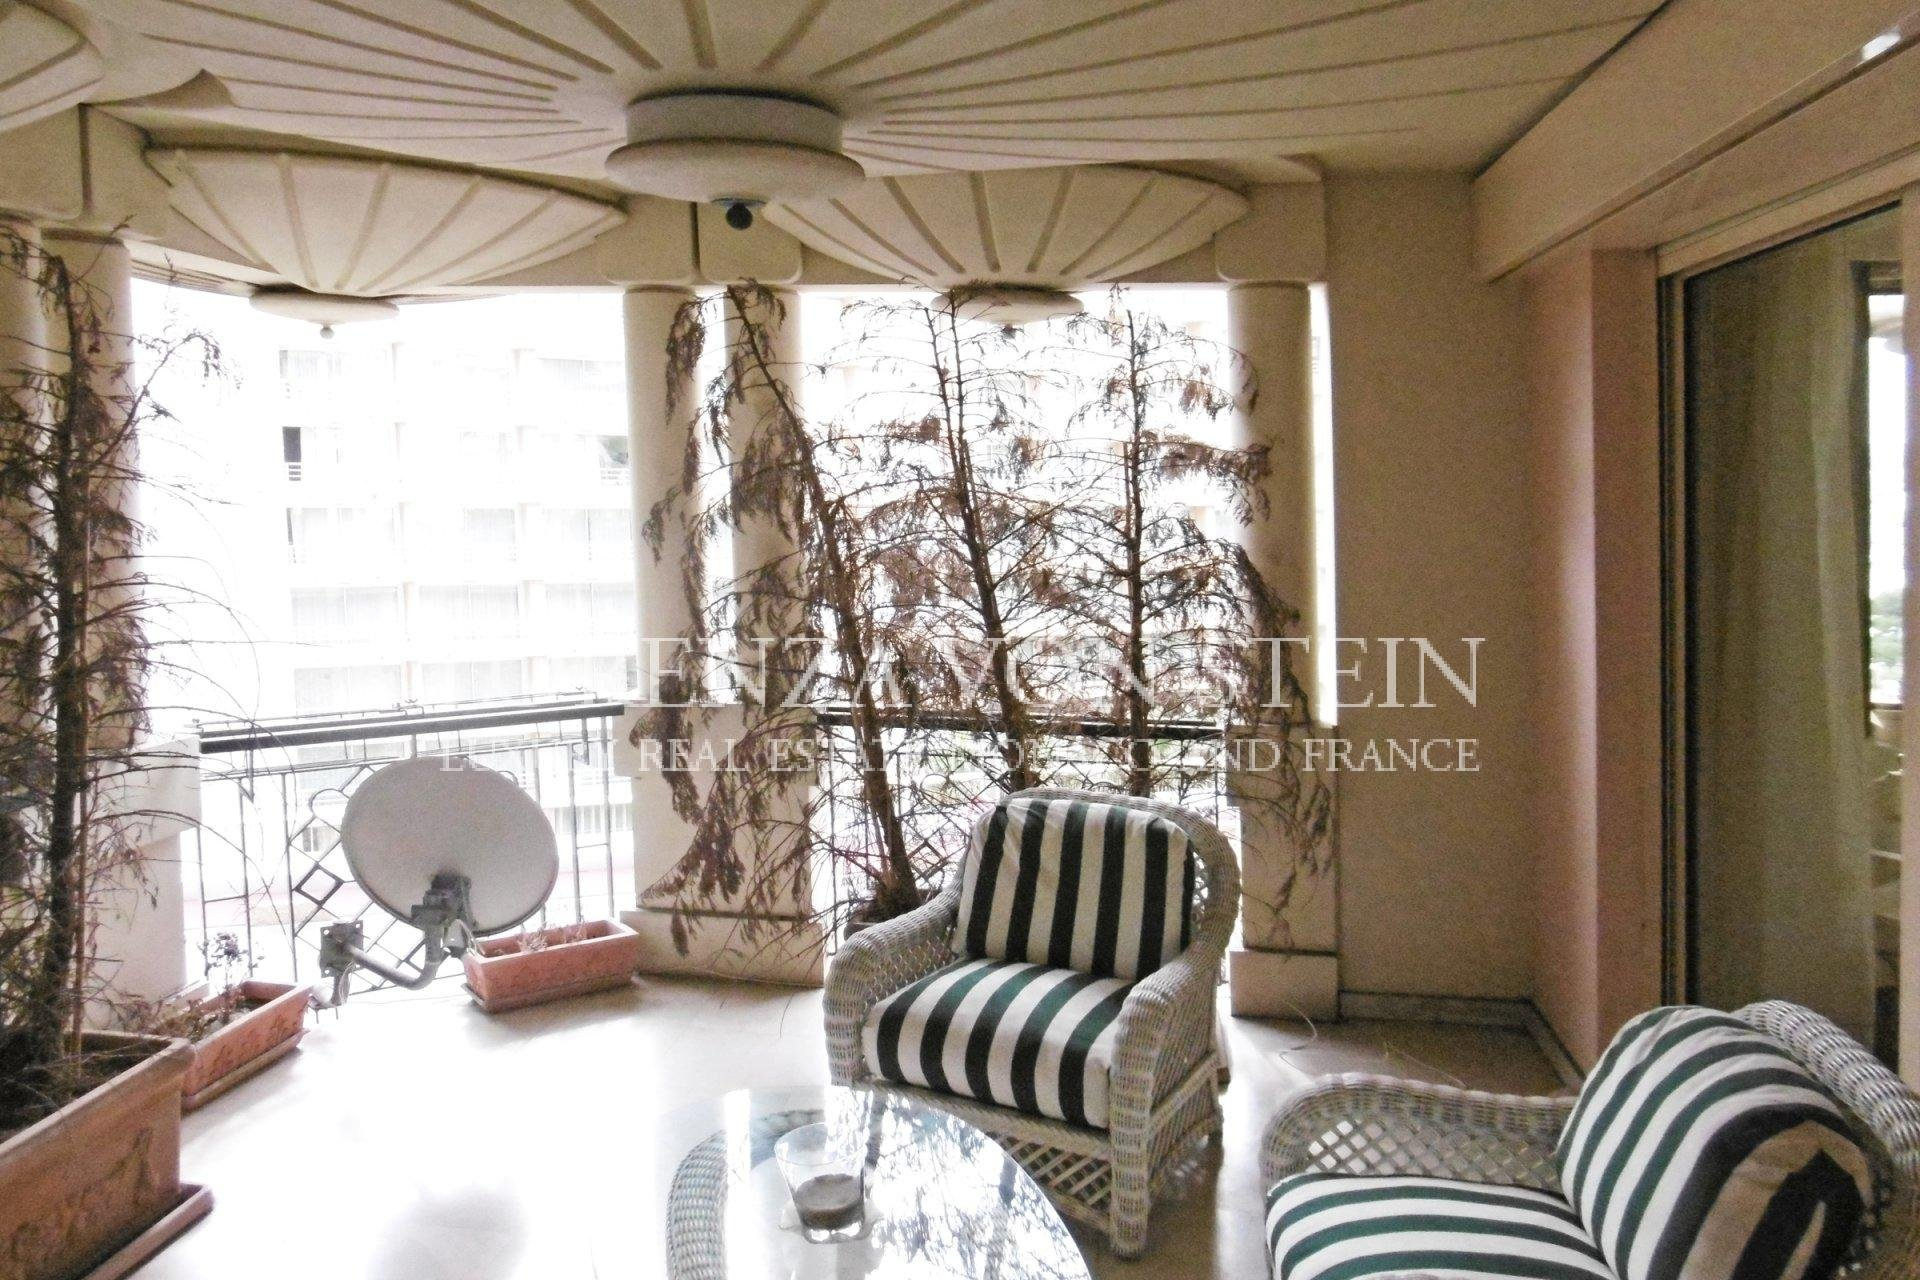 Verkauf Wohnung - Monaco Larvotto - Monaco